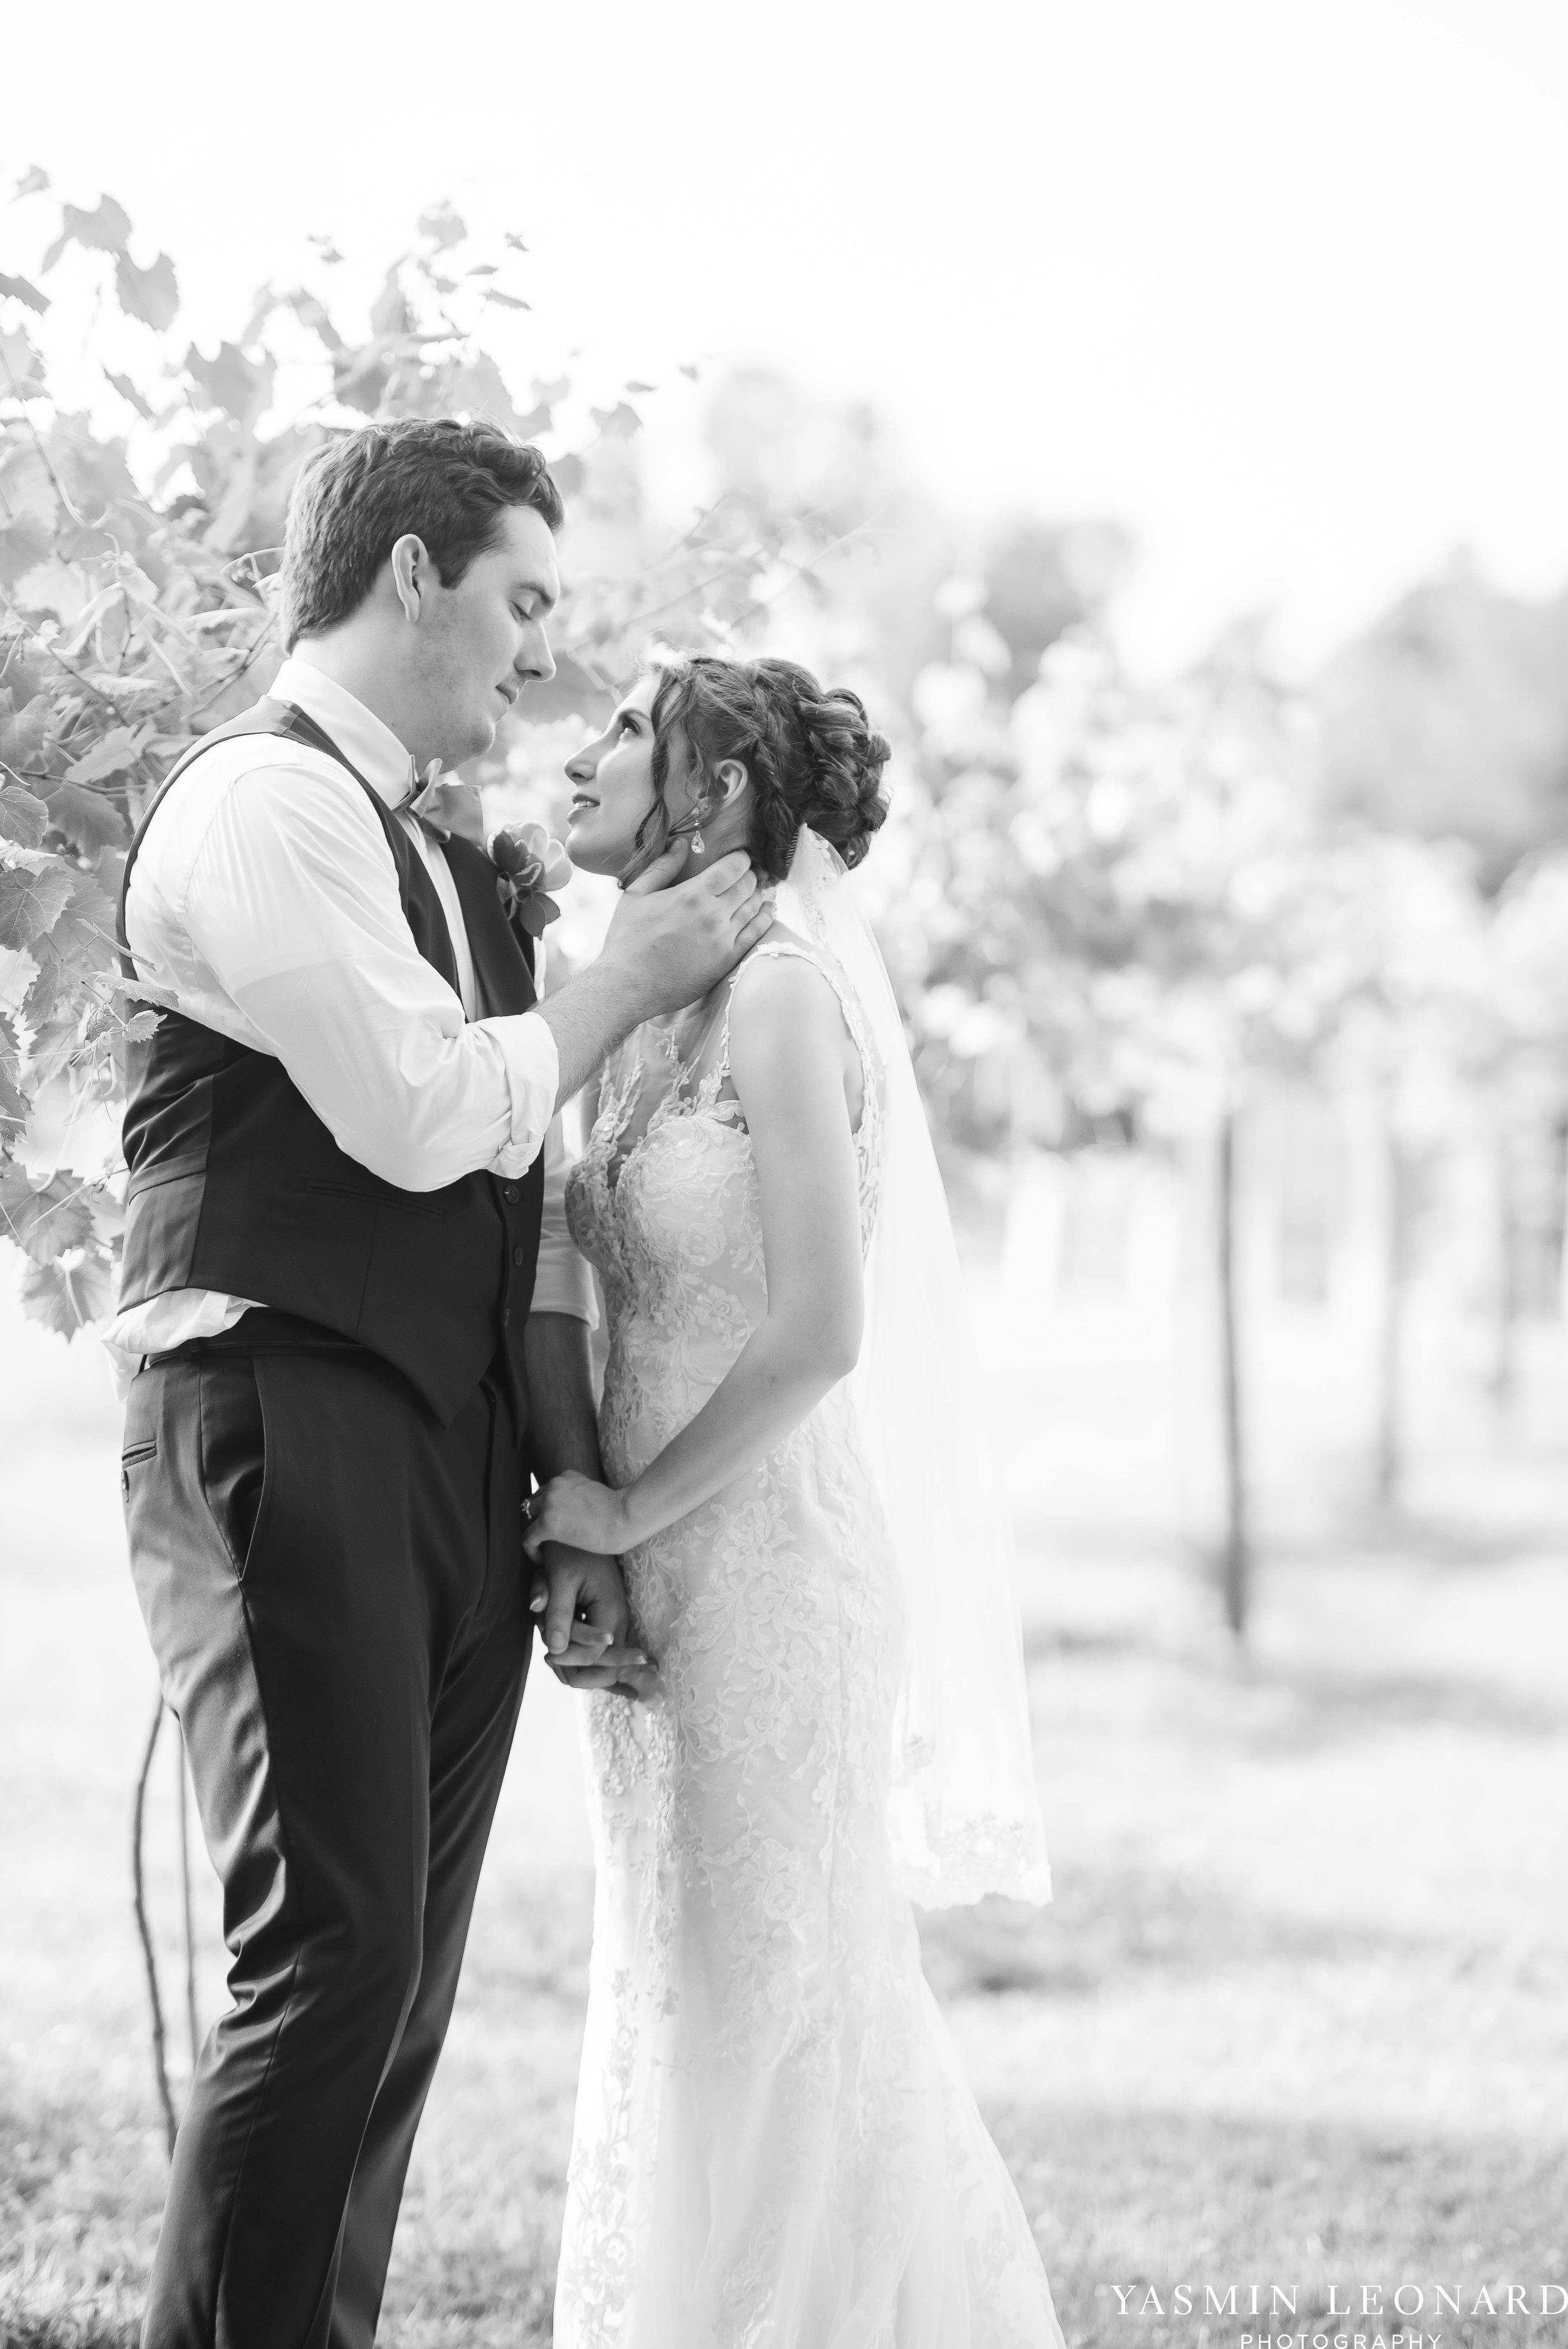 Old Homeplace Vineyard - NC Weddings - Outdoor Summer Weddings - Peony Boutique - Vineyard Wedding - NC Photographer - Yasmin Leonard Photography-42.jpg